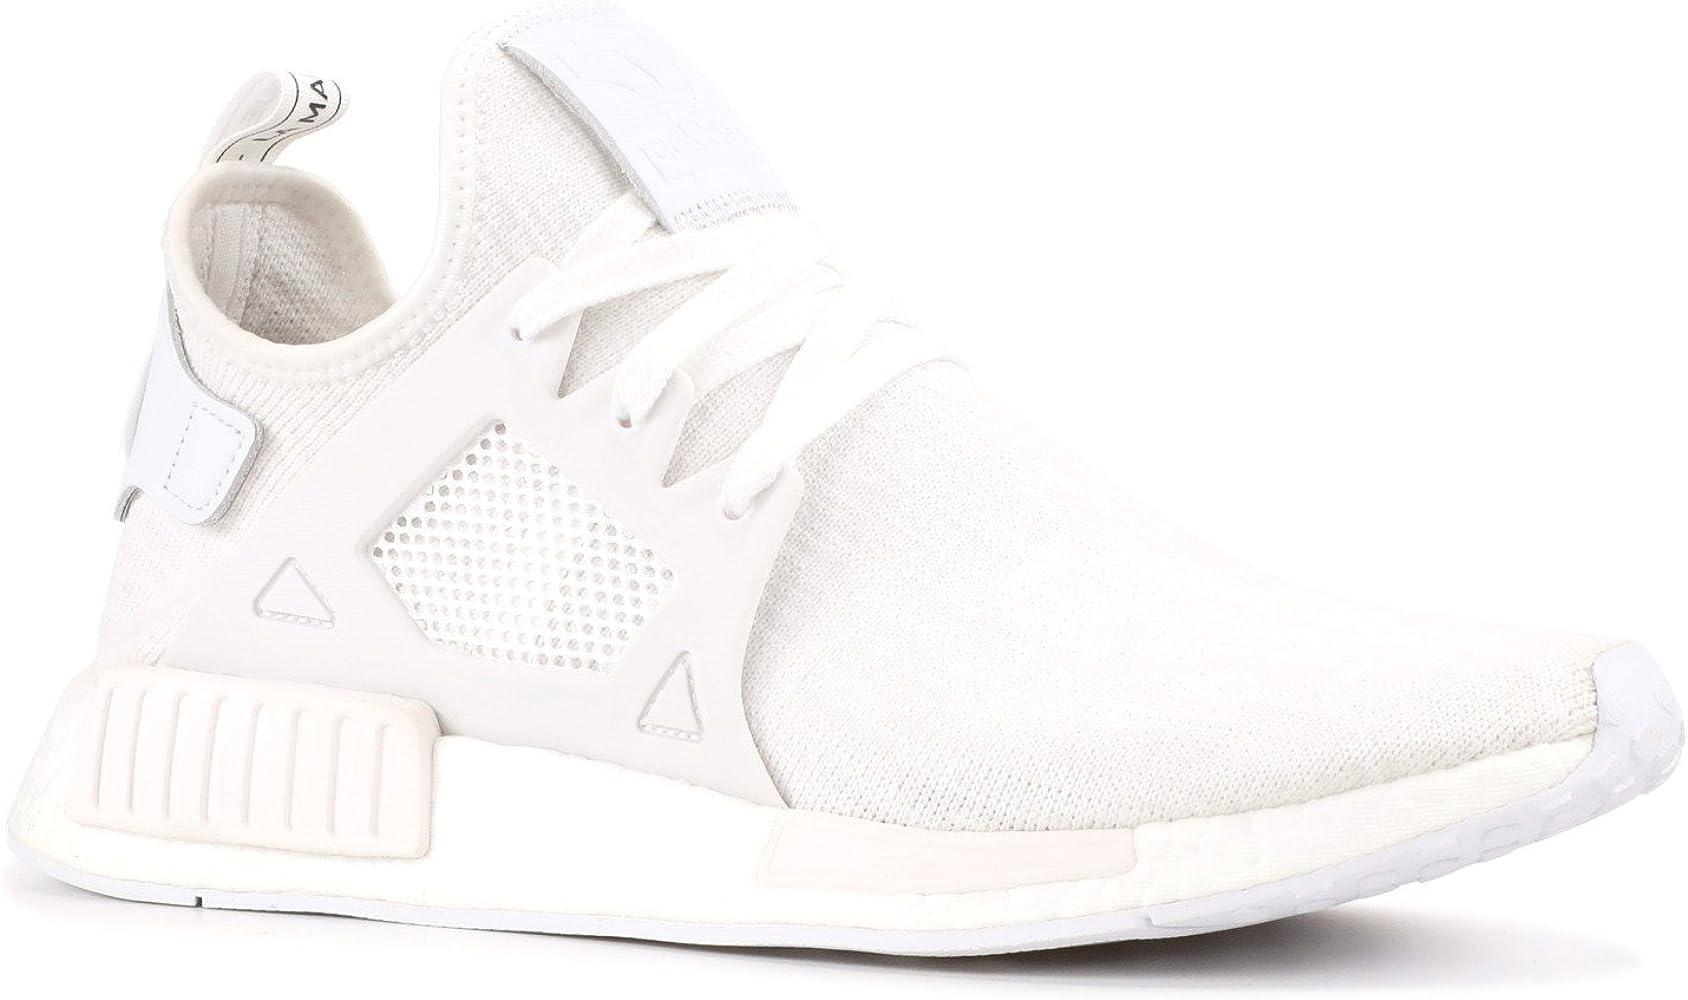 adidas NMD_xr1, Herren Sneaker Cardboard Black Red: Amazon